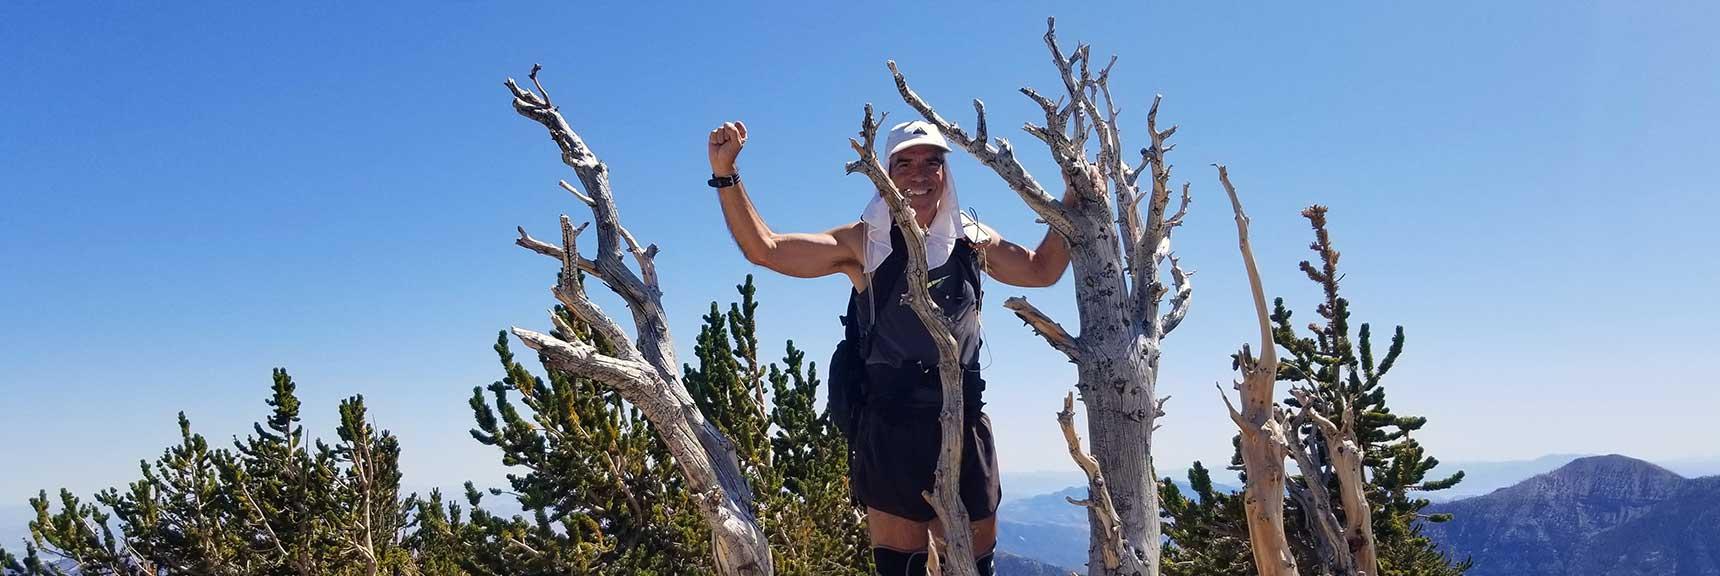 David on the Summit Tree of Mummy Mt. in Nevada